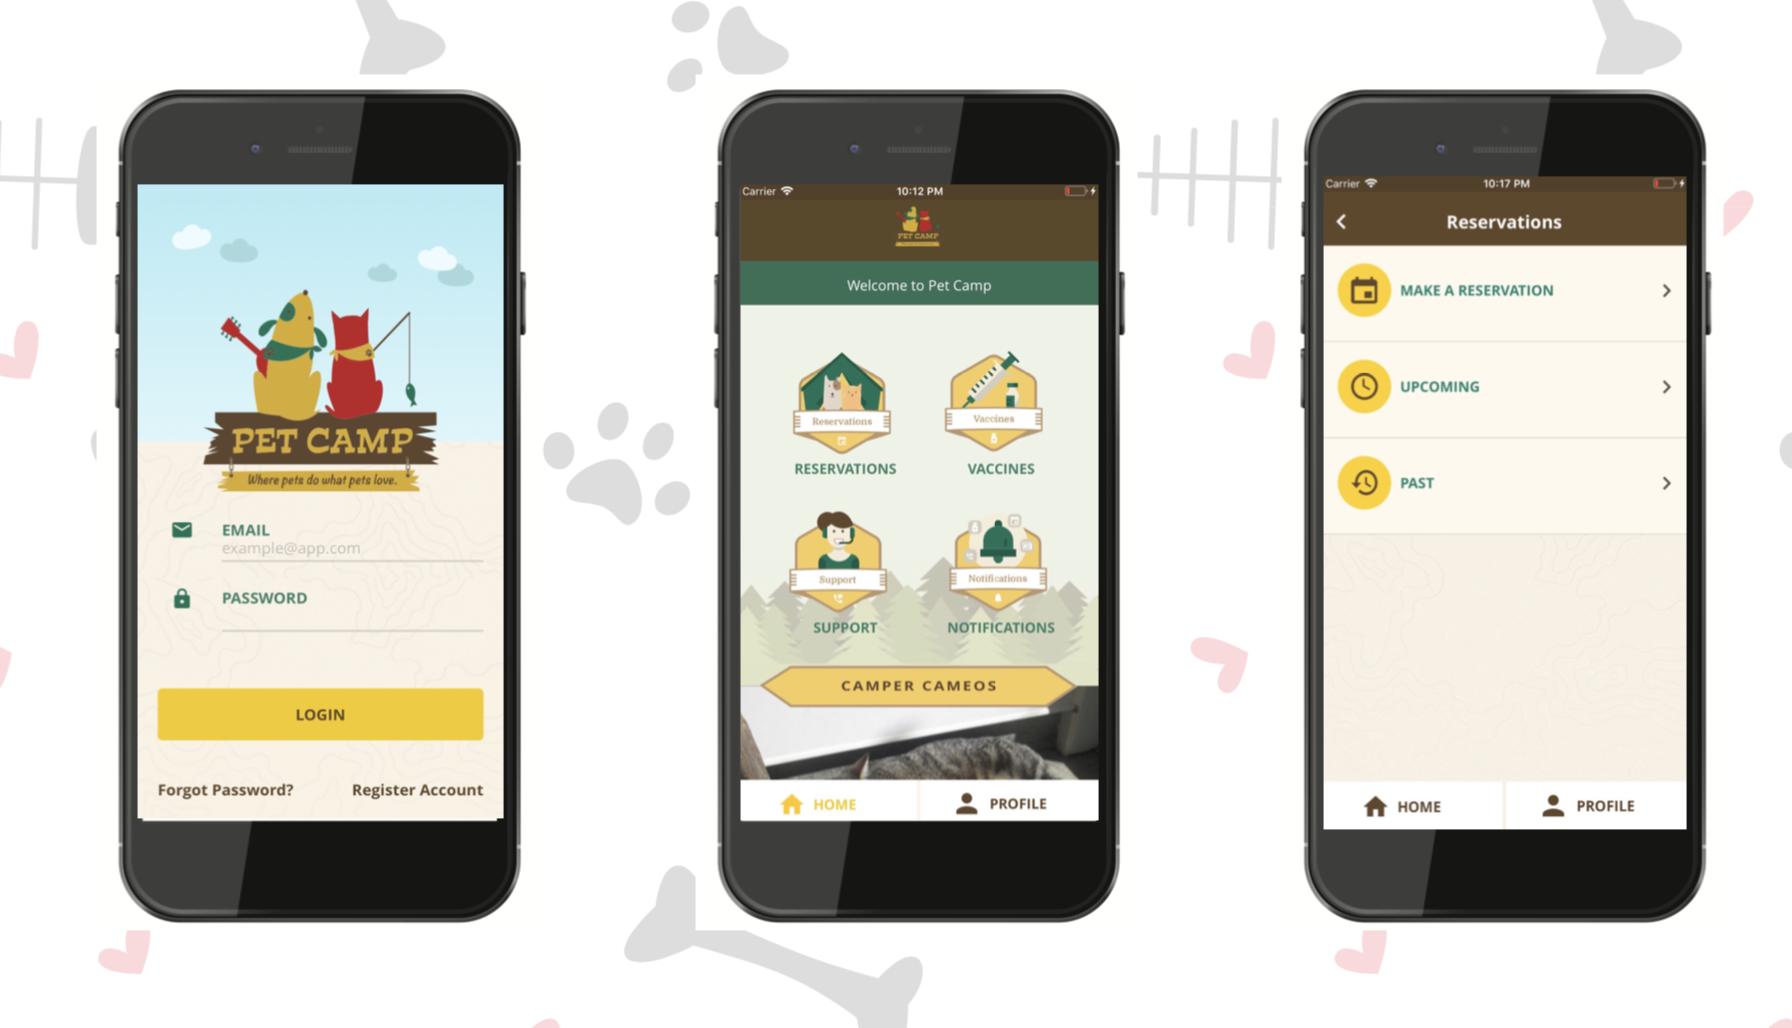 pet camp app